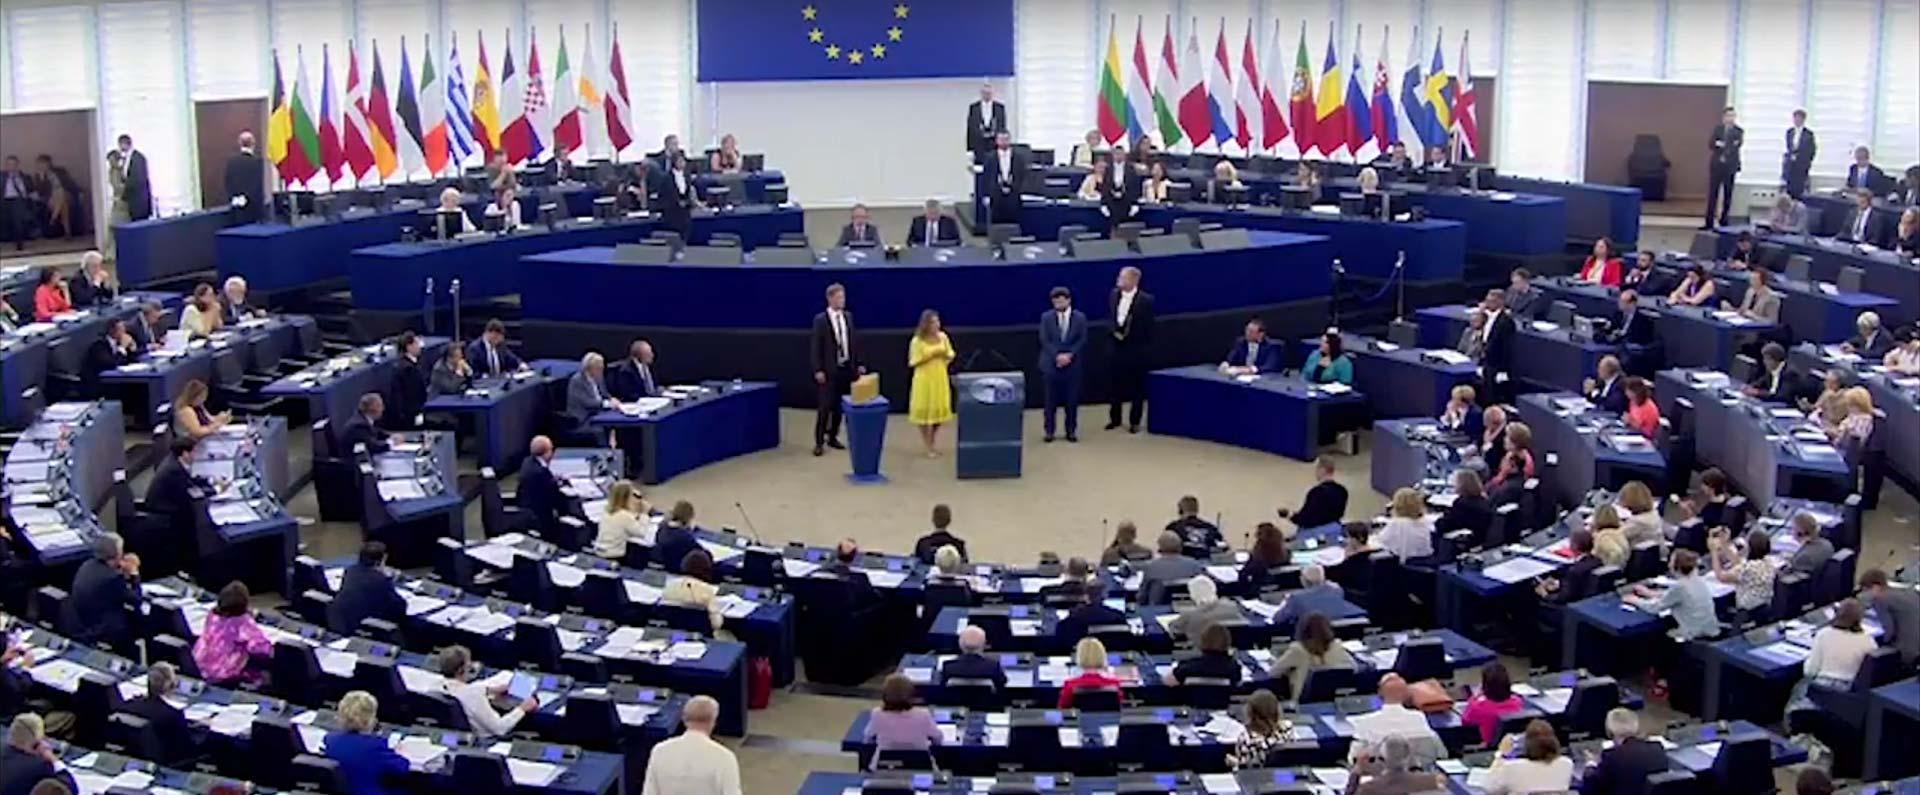 Alexanda Pascalidou talare på European Union 2017